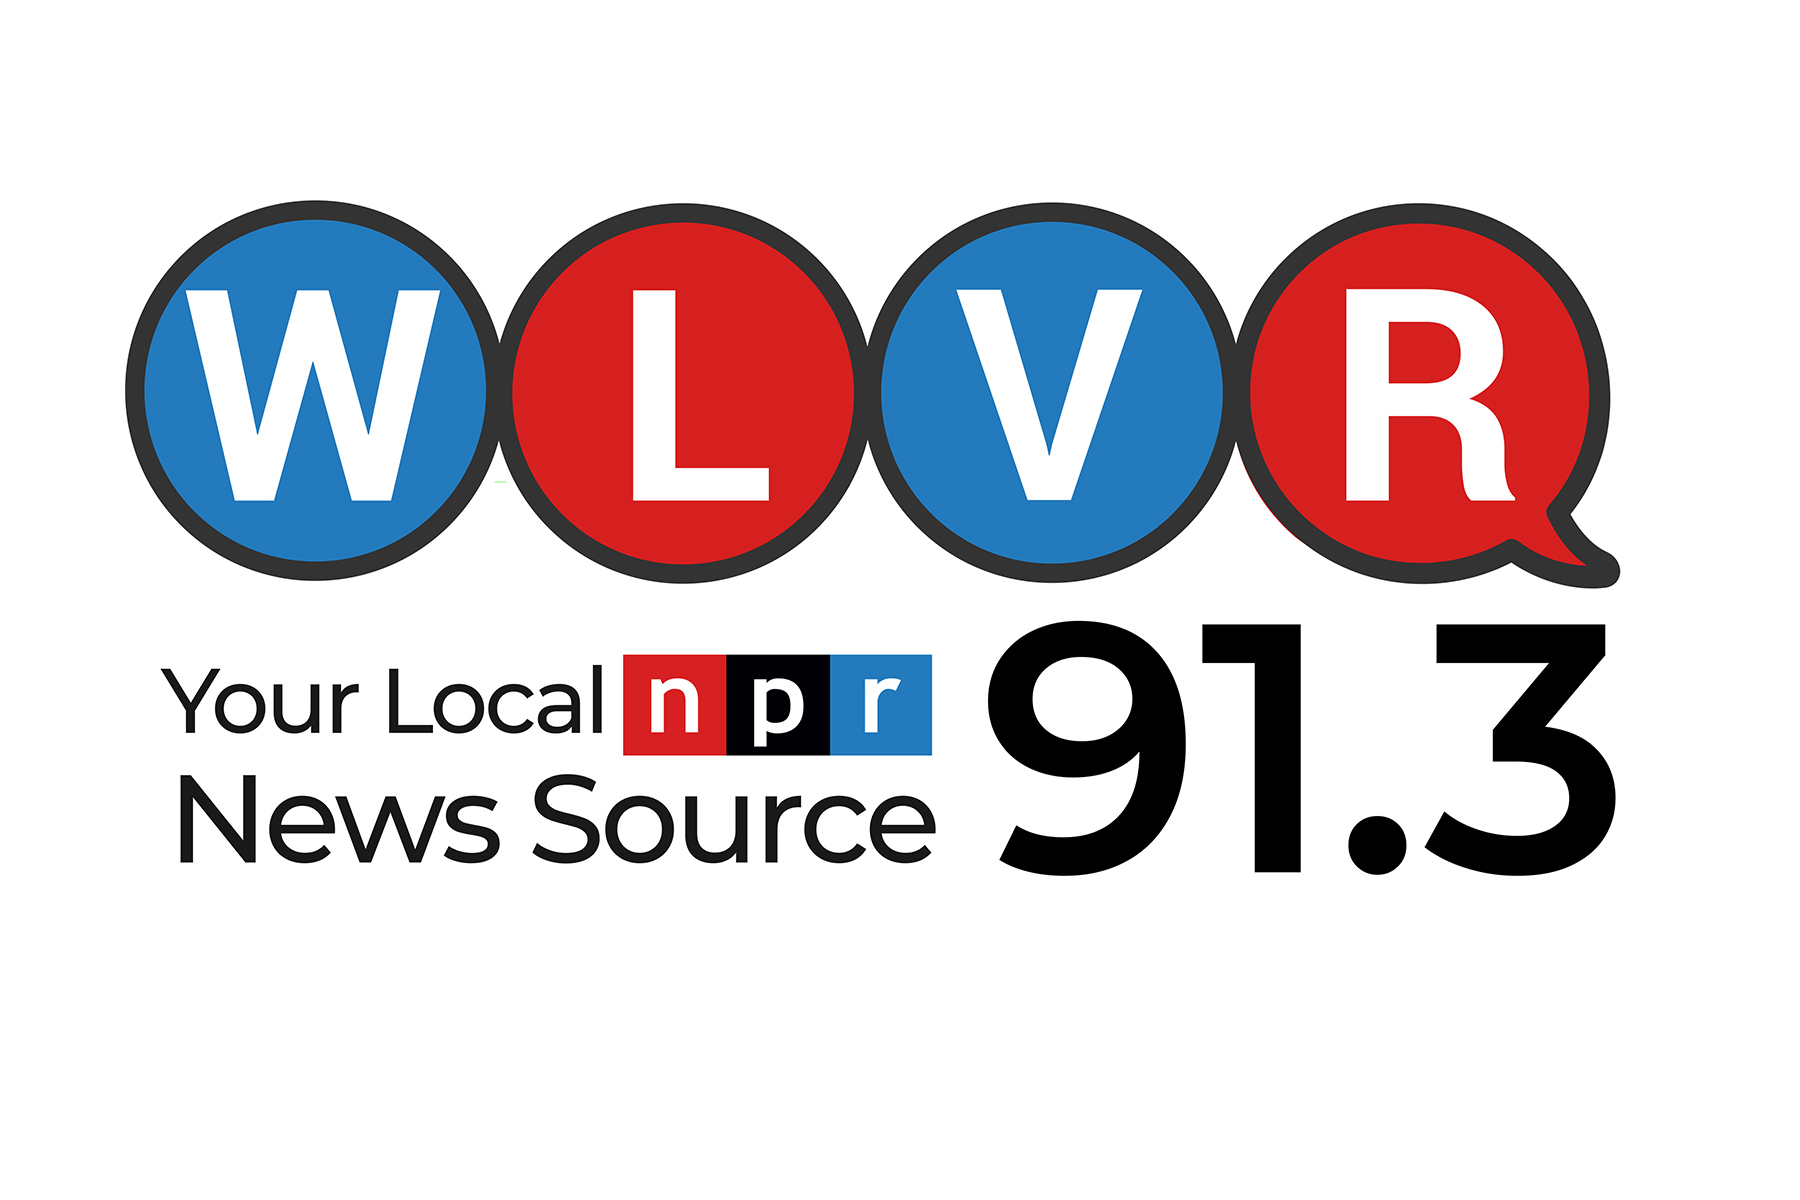 WLVR radio logo